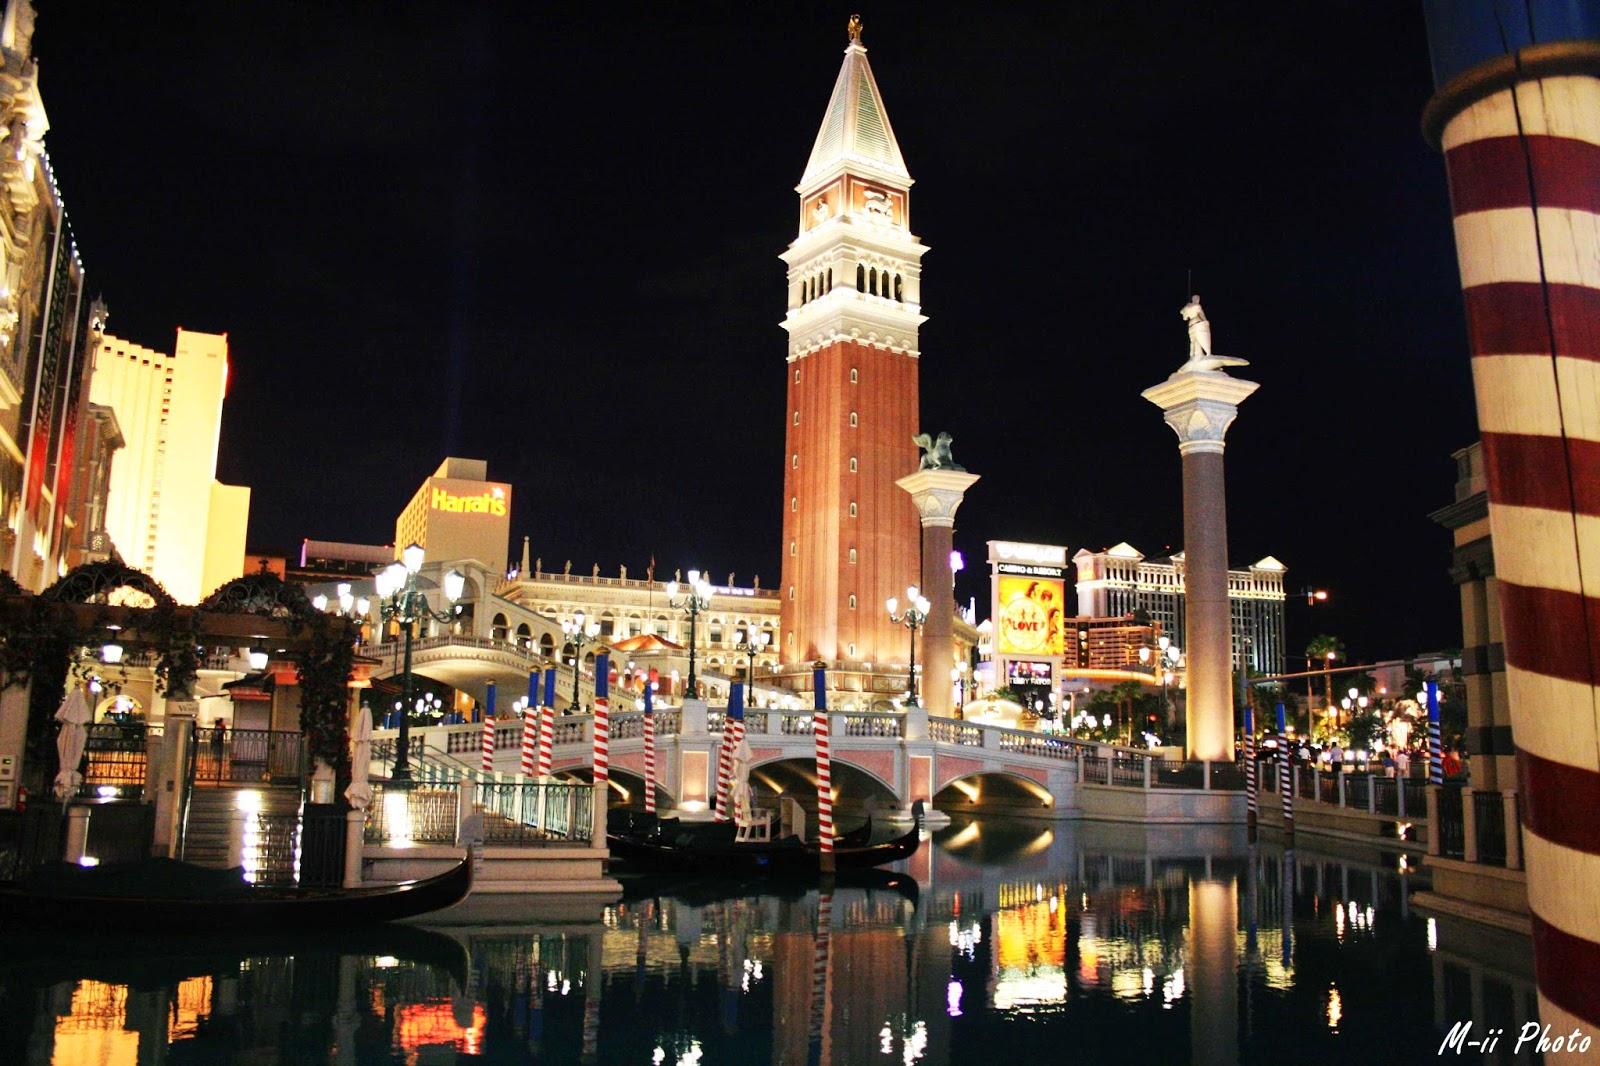 M-ii Photo : Las Vegas The Venetian